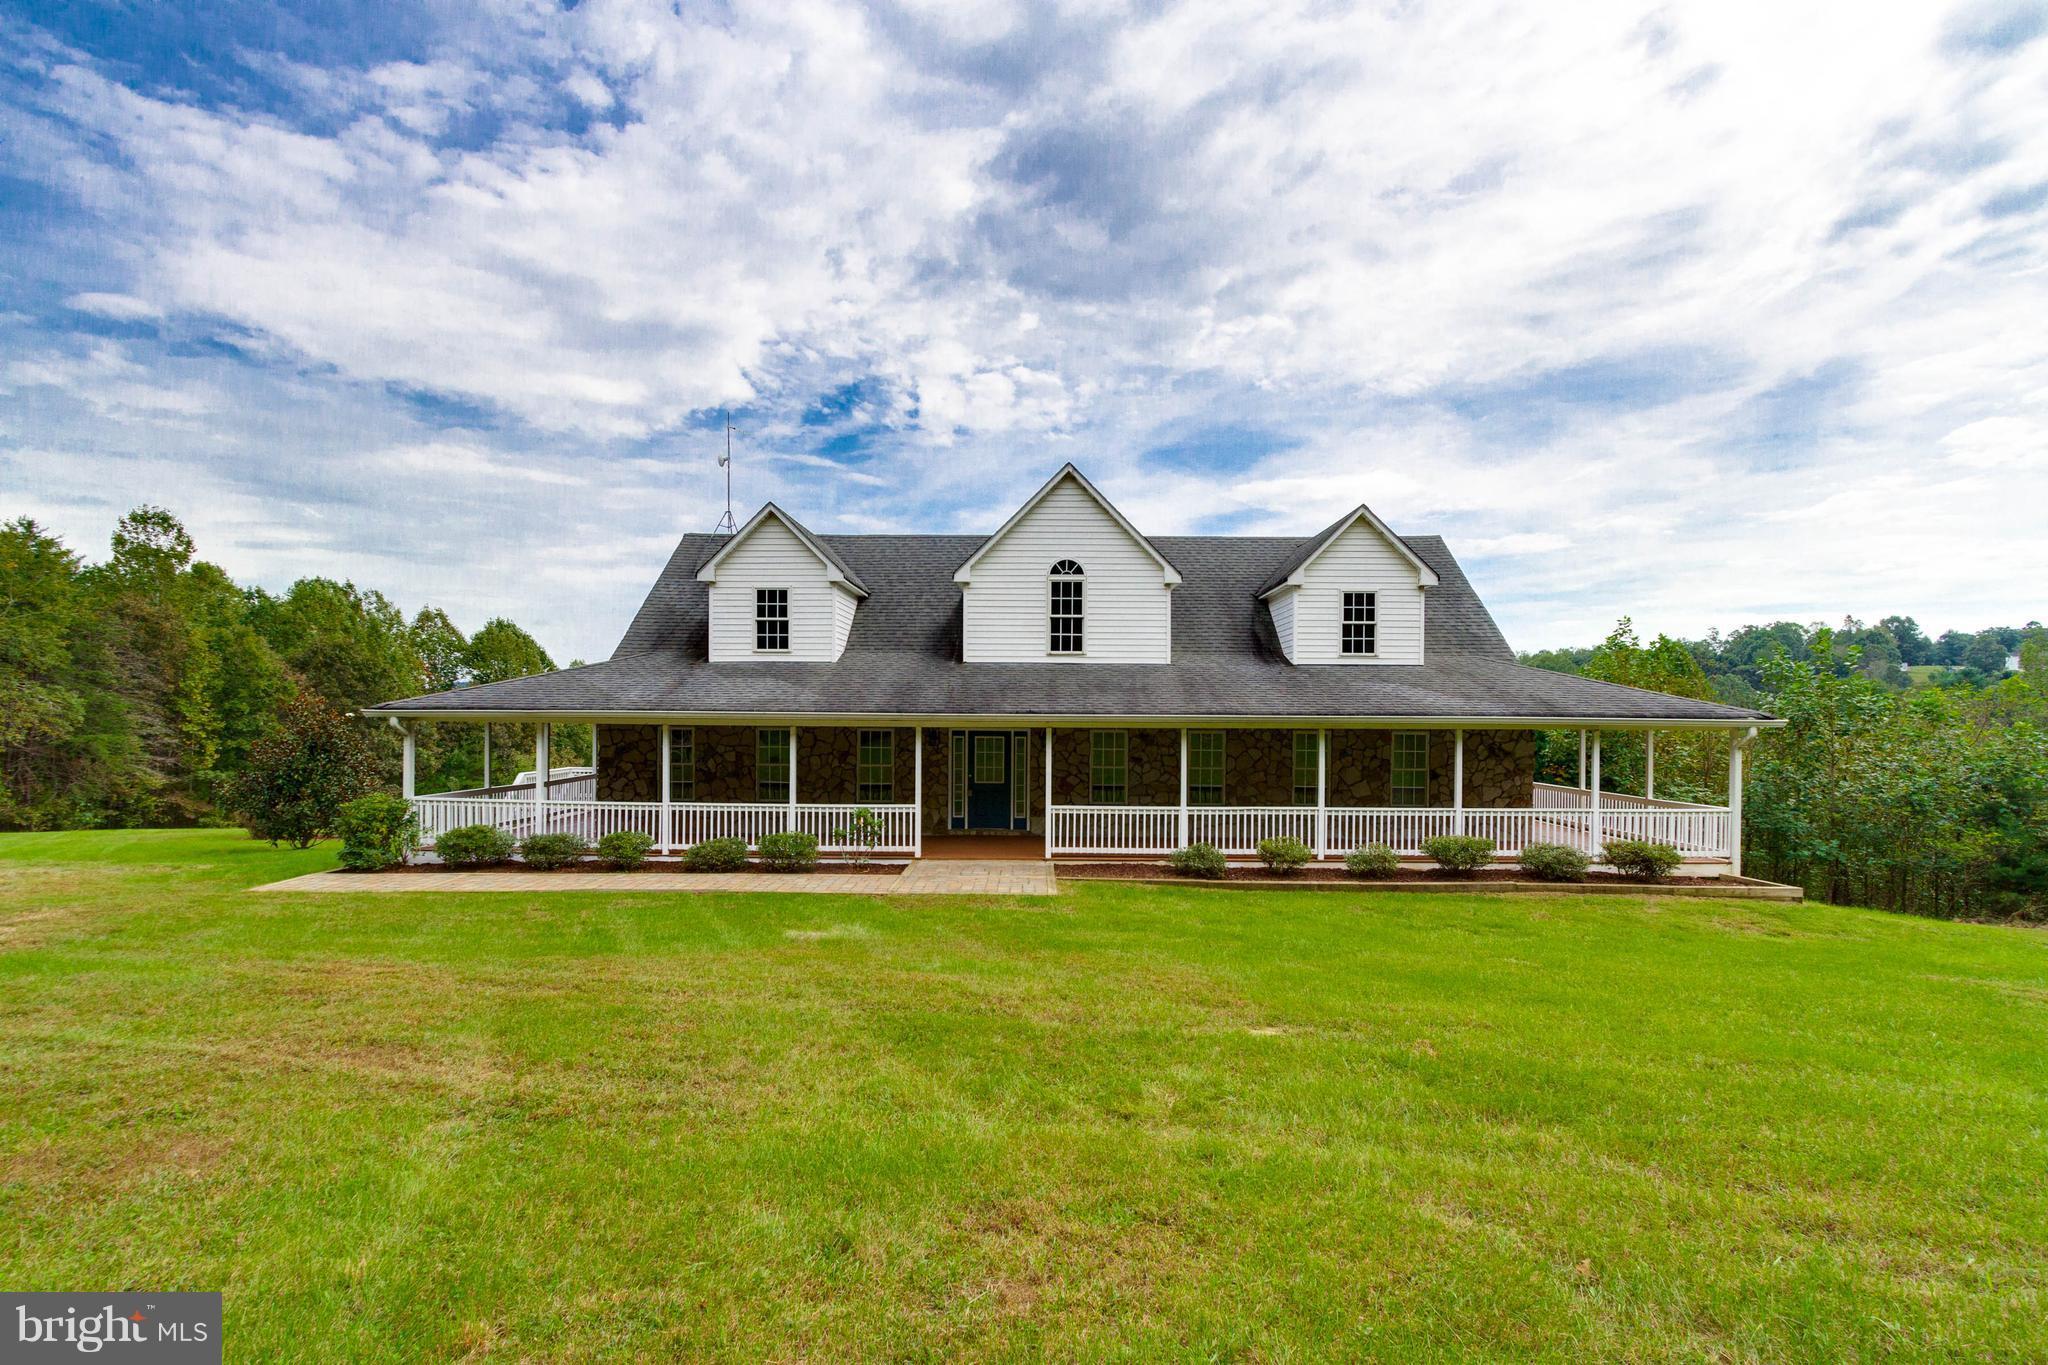 102 CHARLIES FARM LANE, CASTLETON, VA 22716